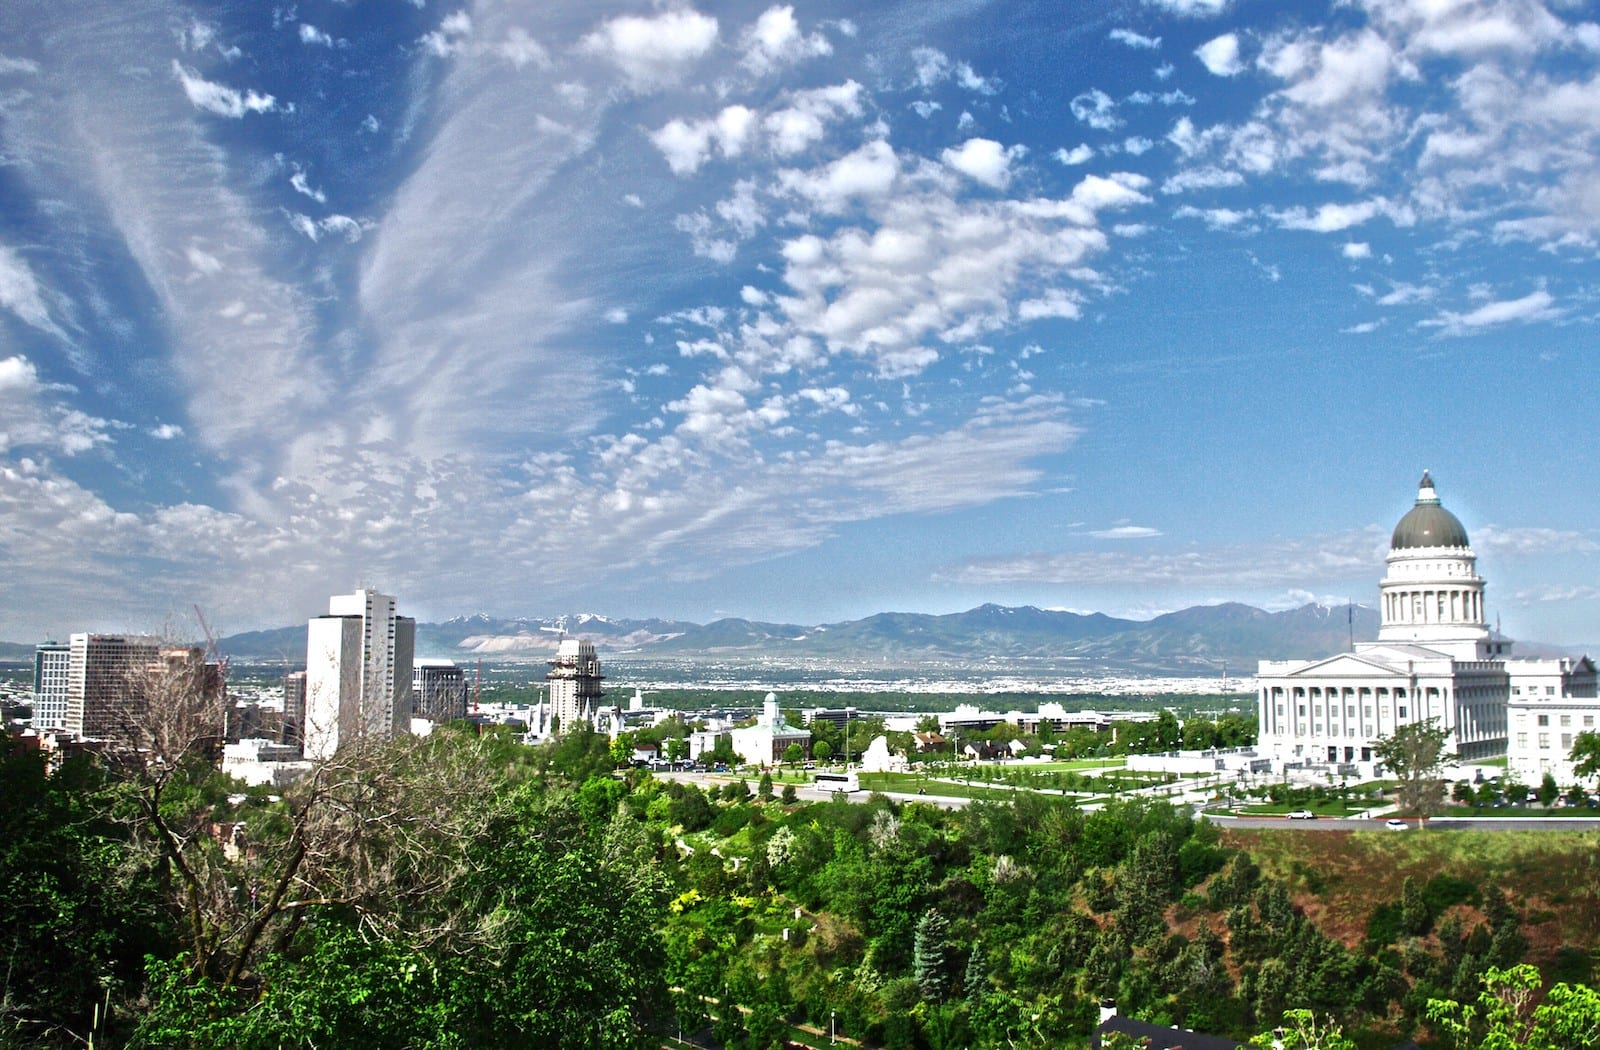 Capitol of the Beehive State, Utah